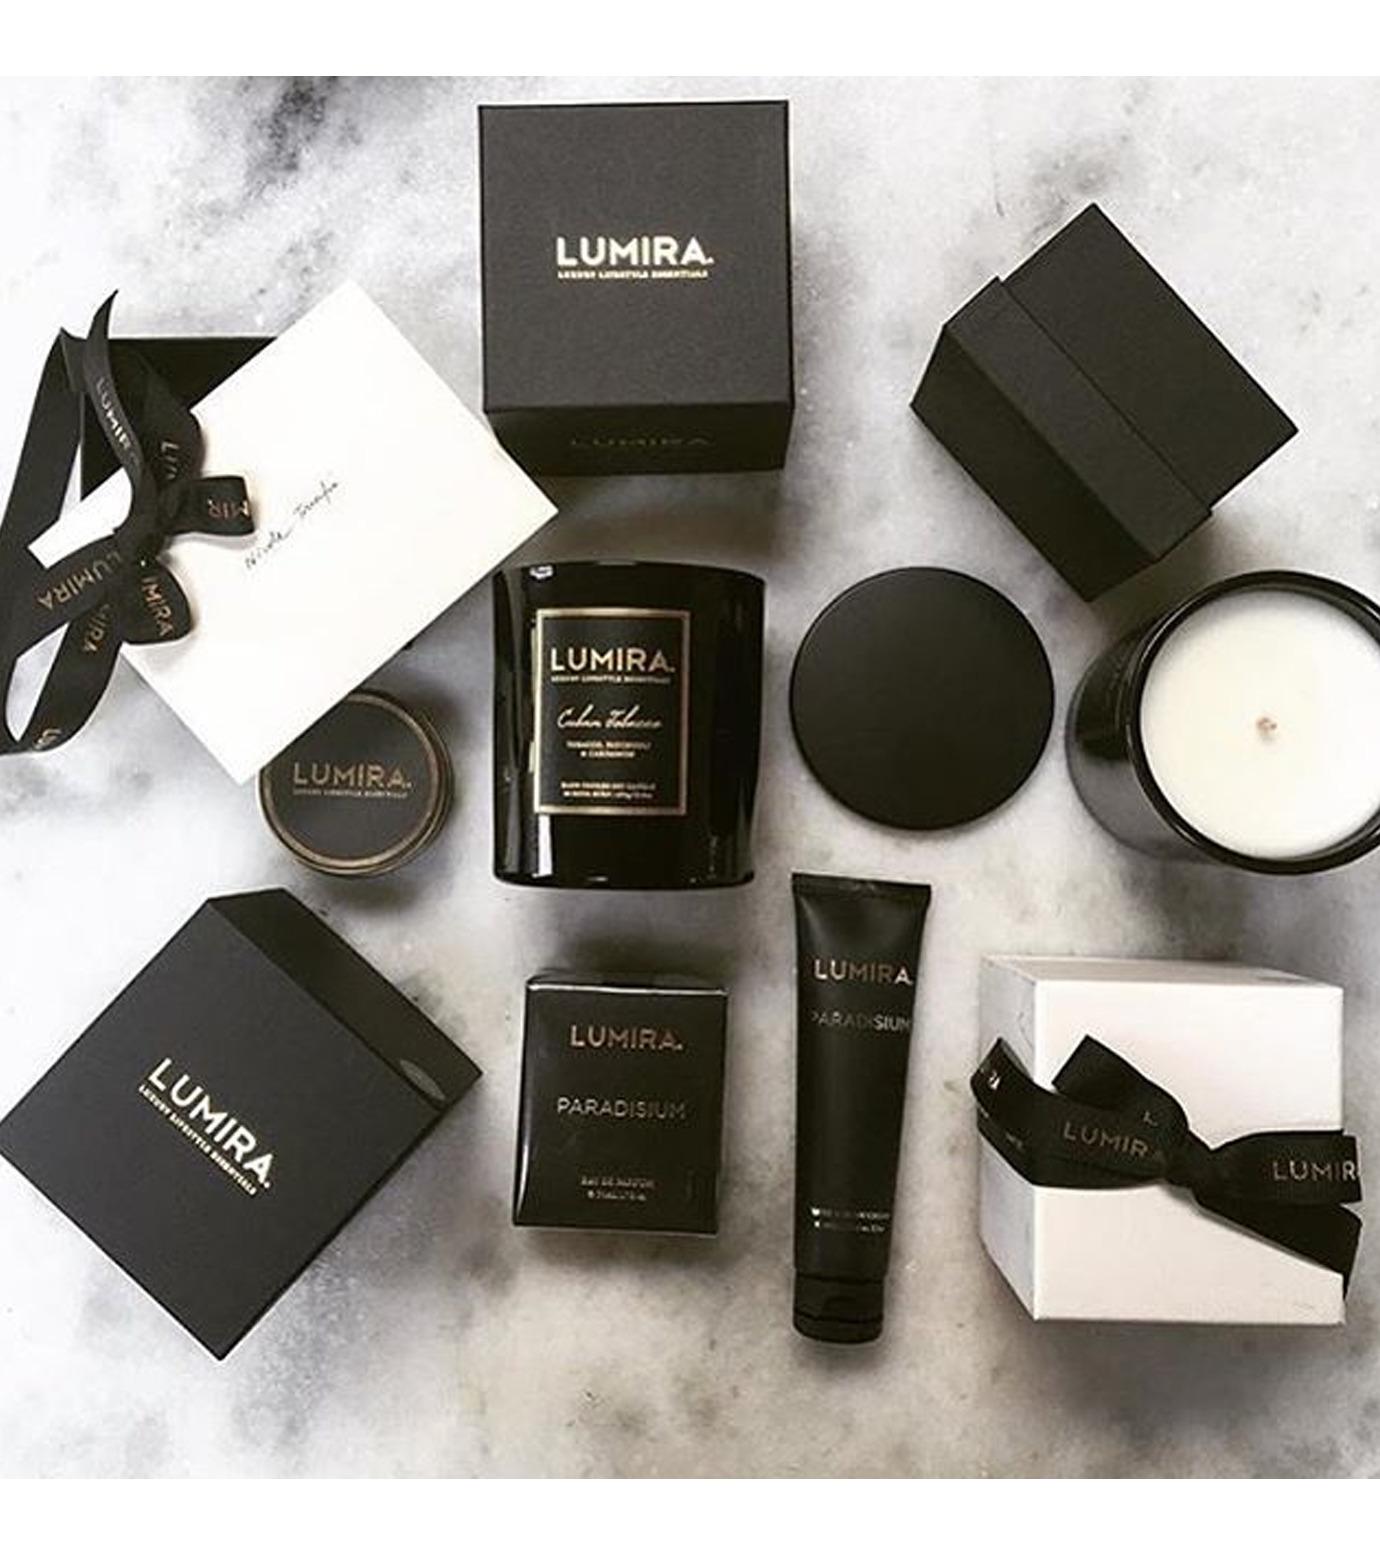 LUMIRA(ルミラ)のDestination Candle Tuscan Fig-BLACK(キャンドル/candle)-103-CA-010-13 拡大詳細画像3